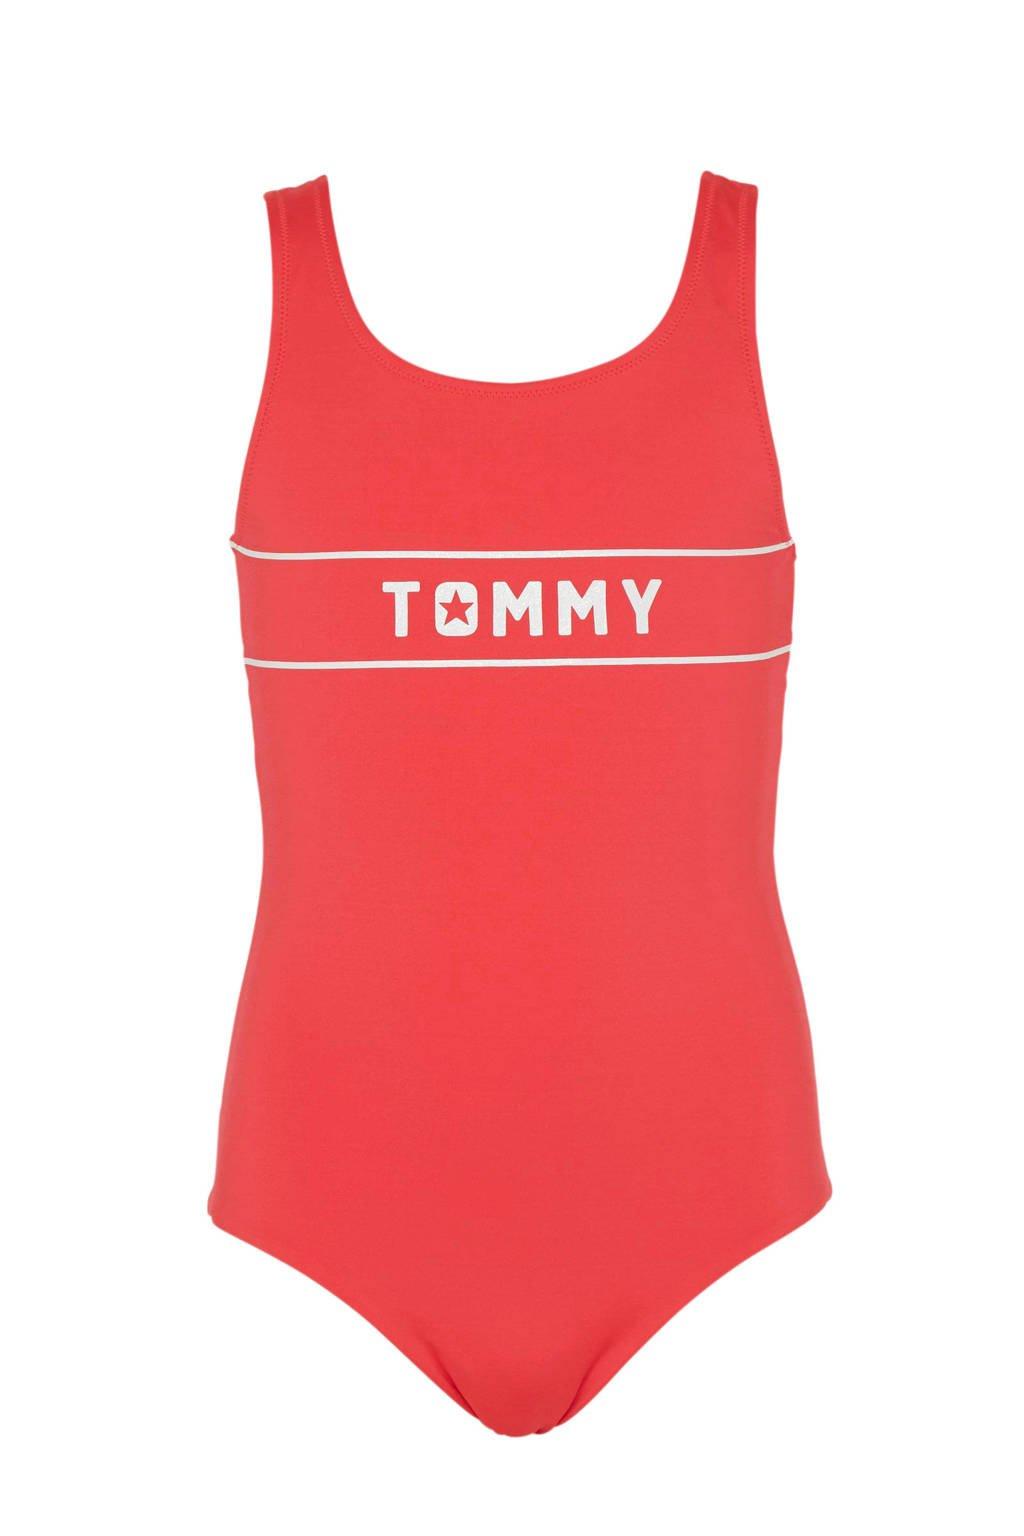 Tommy Hilfiger badpak met printopdruk roze, Roze/wit